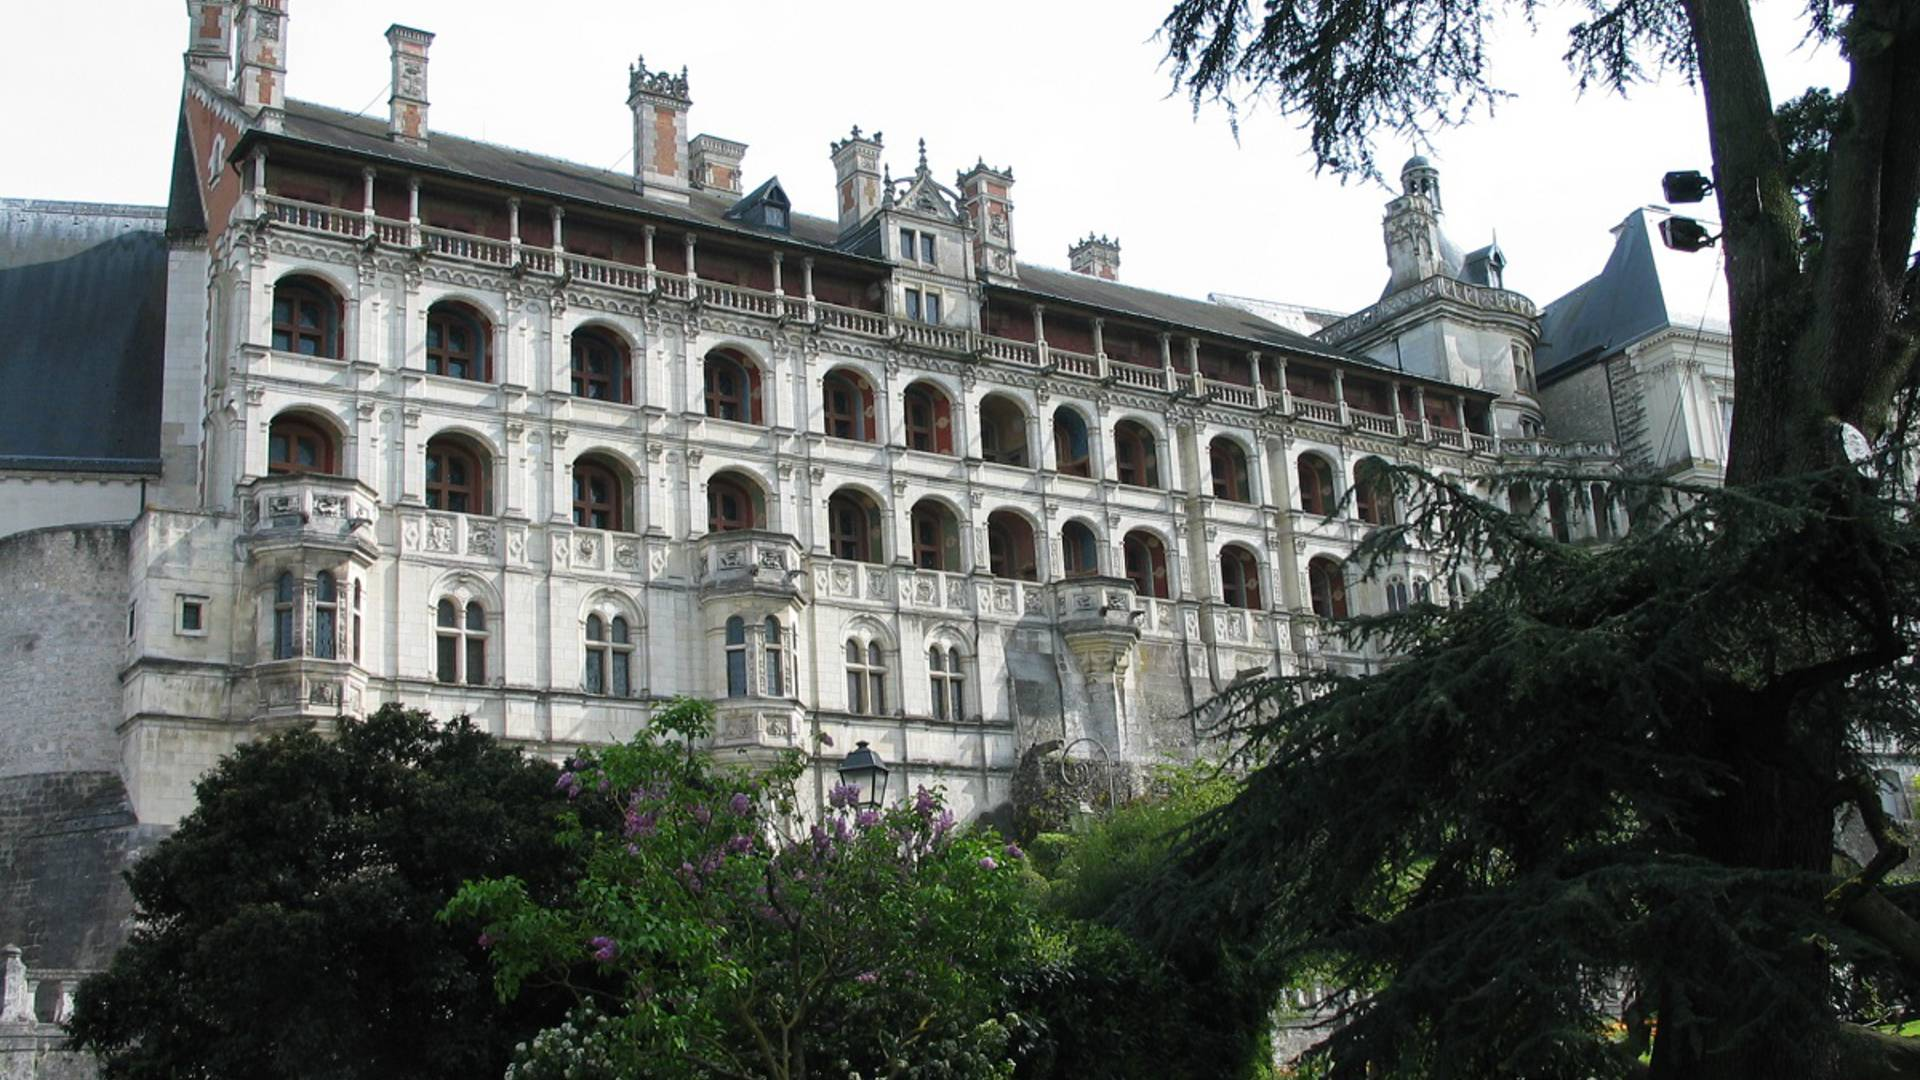 L'ala Francesco I del castello reale di Blois